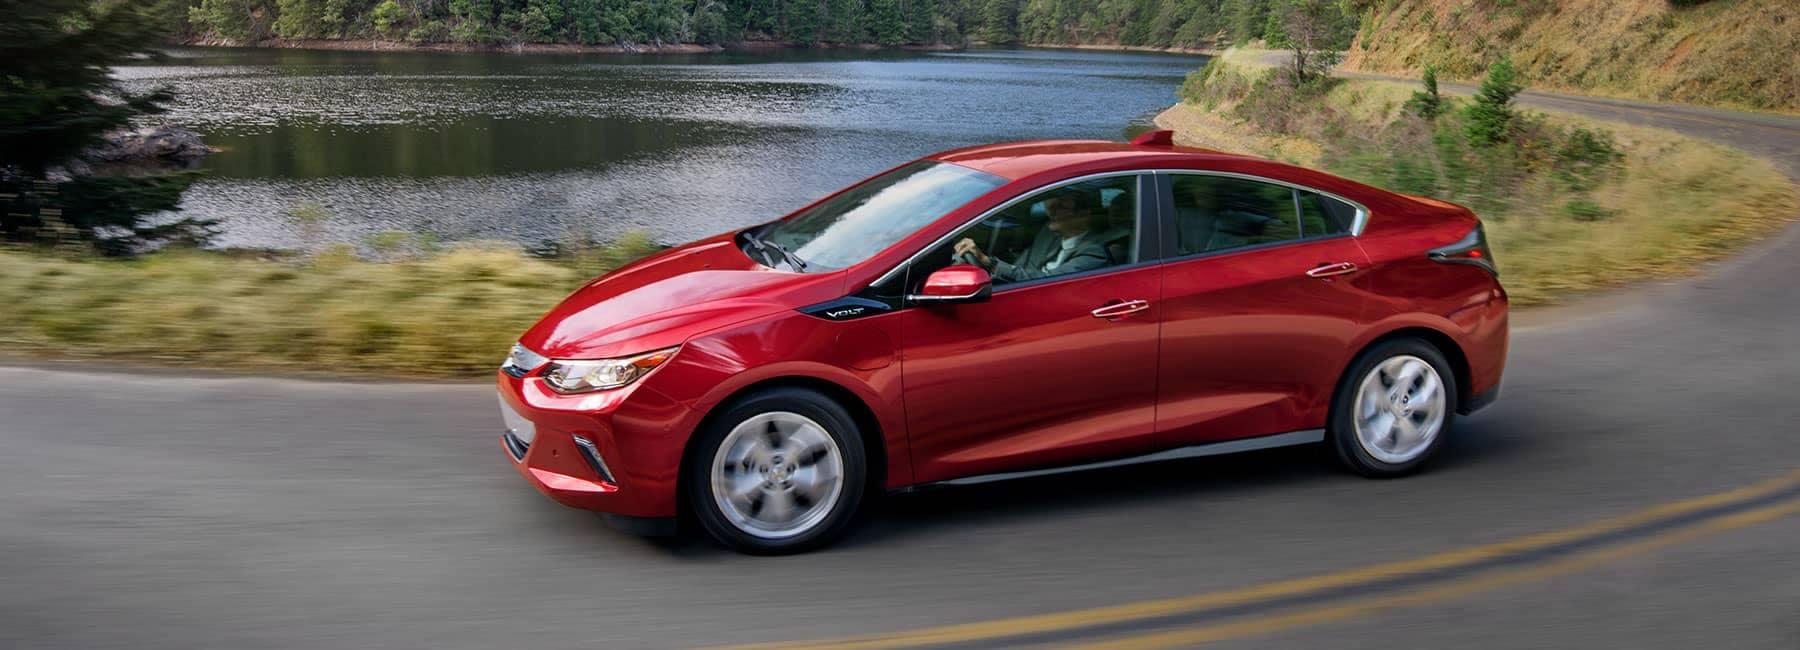 Chevrolet on curvy road